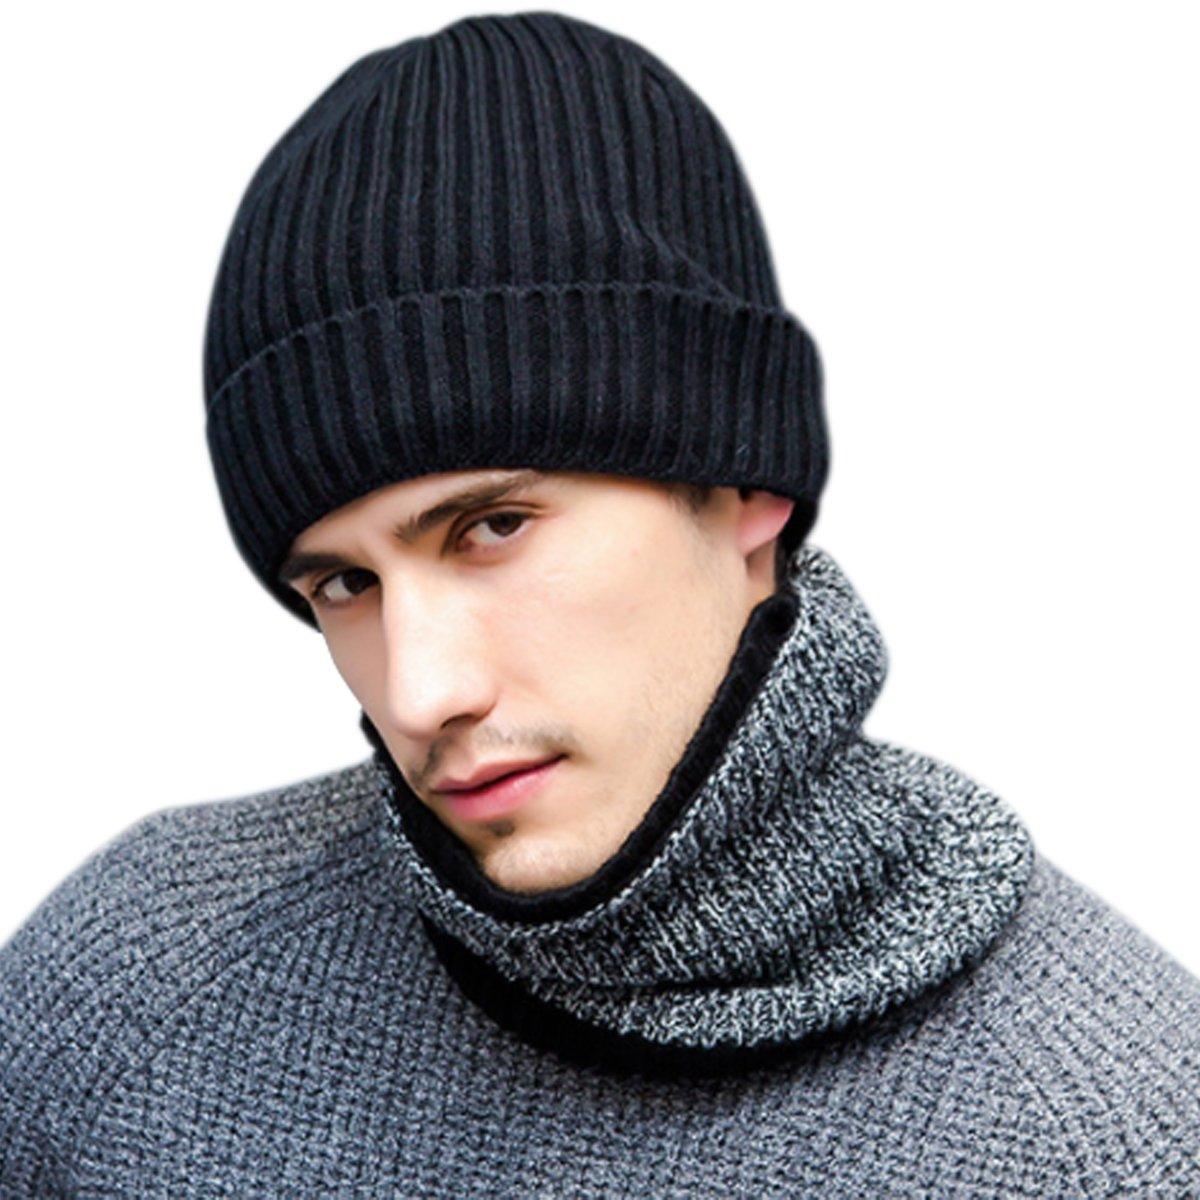 JOYEBUY Stylish Men 3 PCS Warm Winter Set Wool Knitted Beanie Hat + Scarf + Touch Screen Gloves (Black)